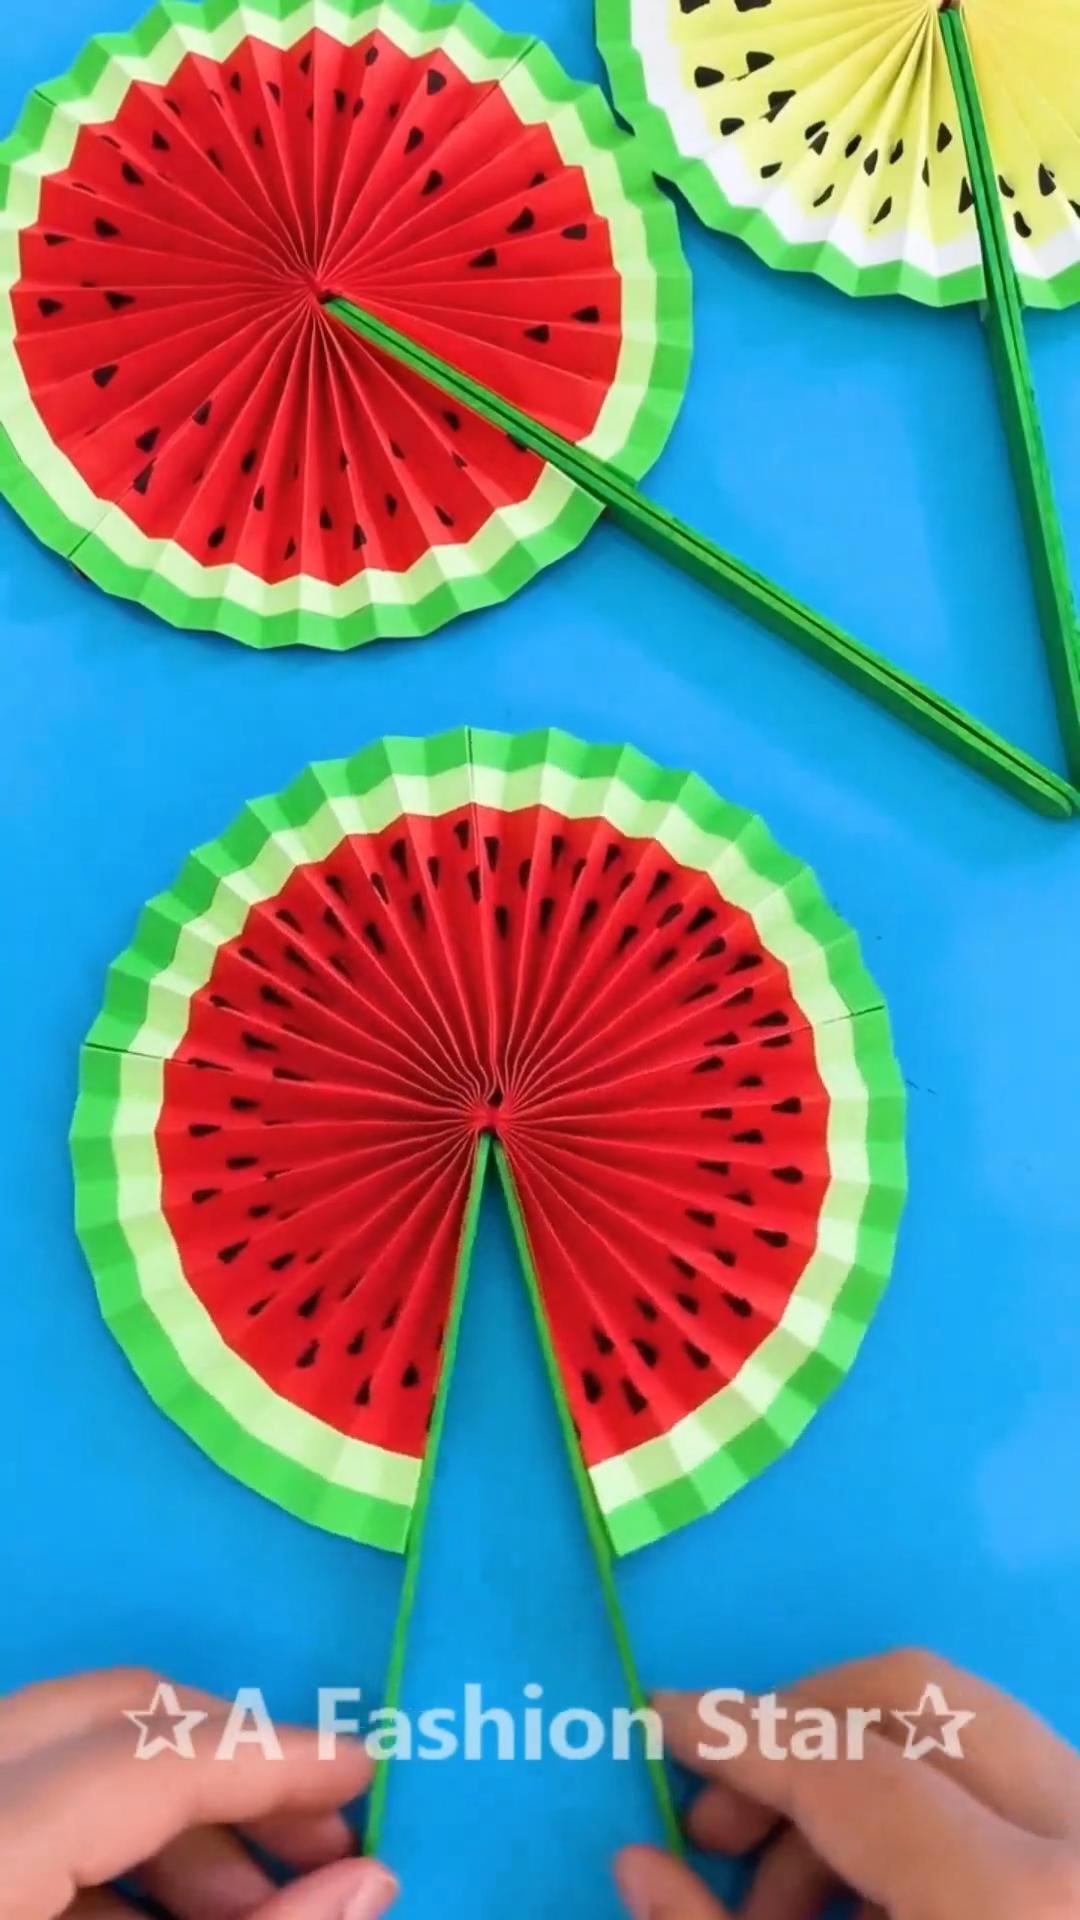 Creative Paper Craft Idea Video Origami Crafts Flower Diy Crafts Paper Crafts